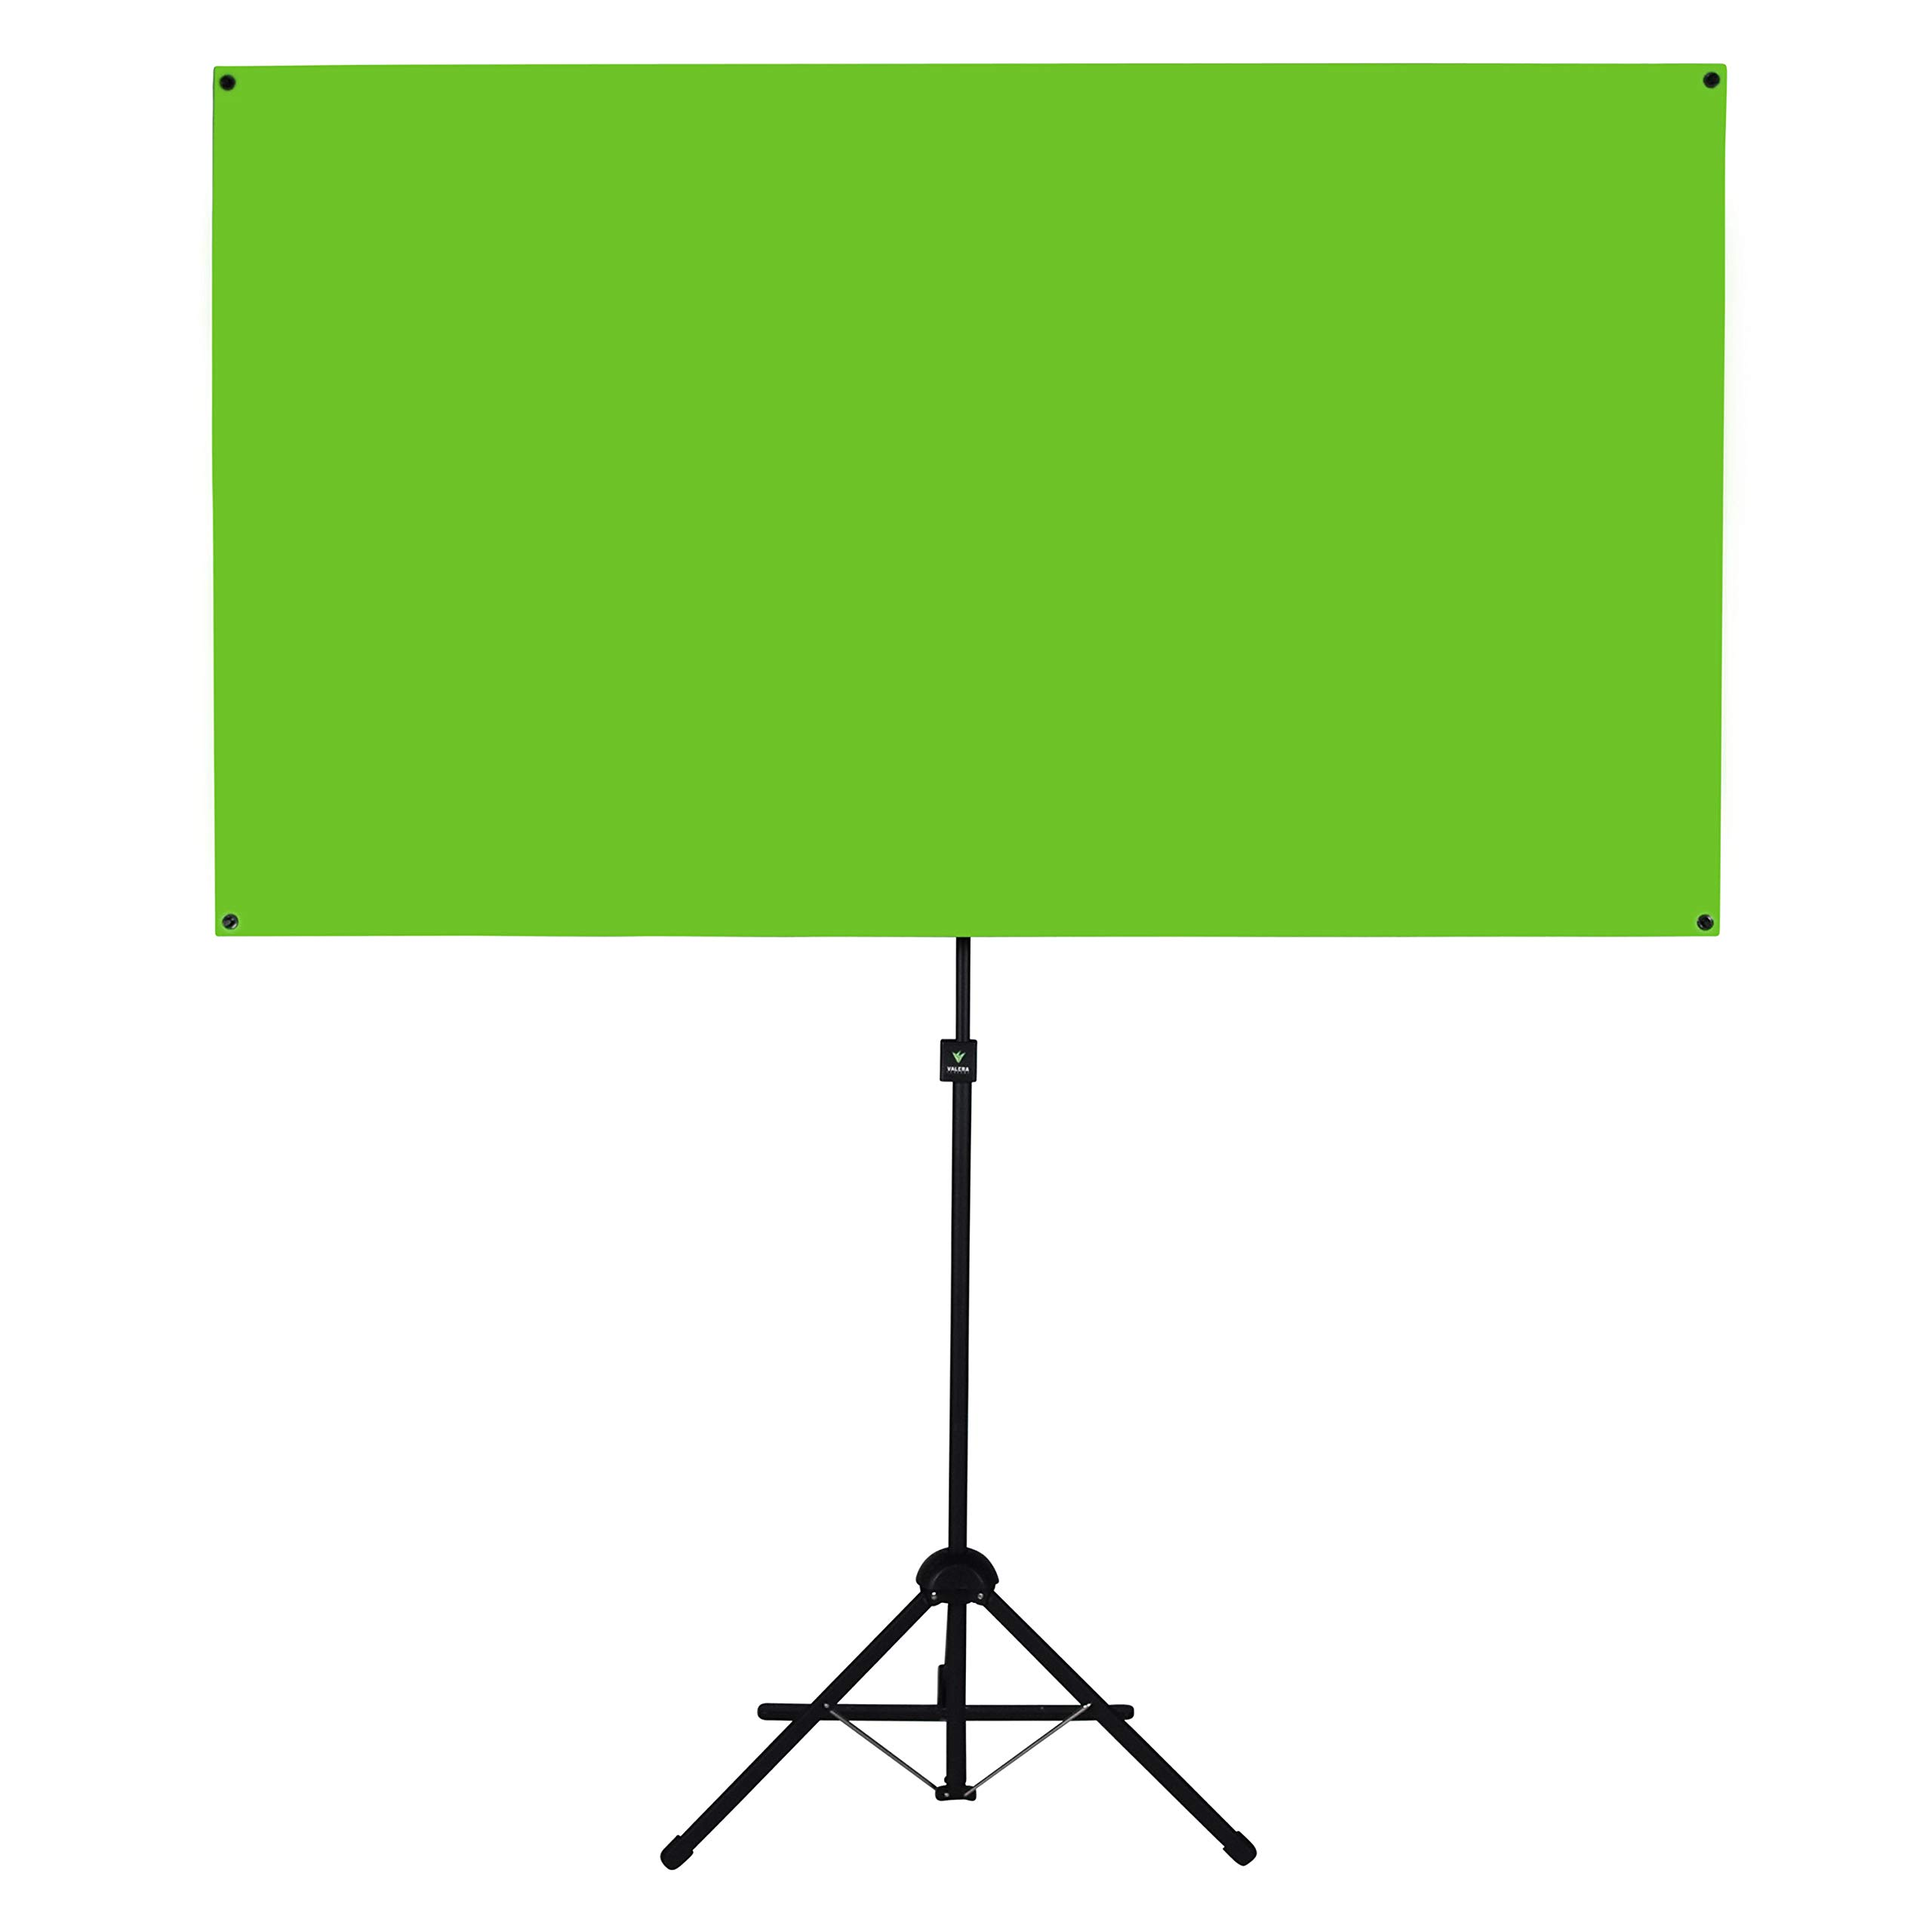 Elgato Green Screen - Collapsible chroma key panel for